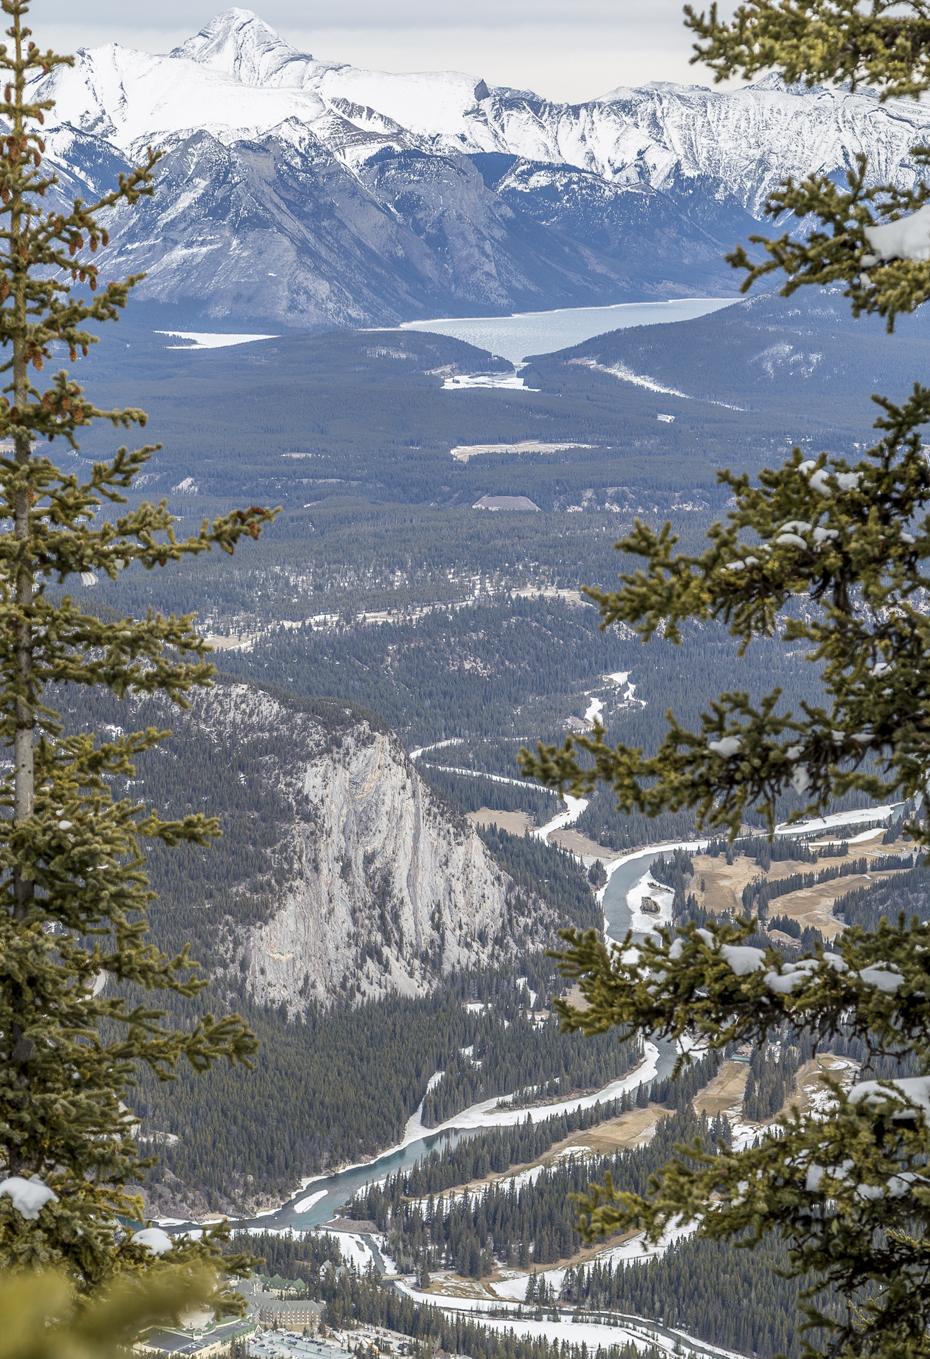 Banff-Sulphur-Mountain-Aussicht-3